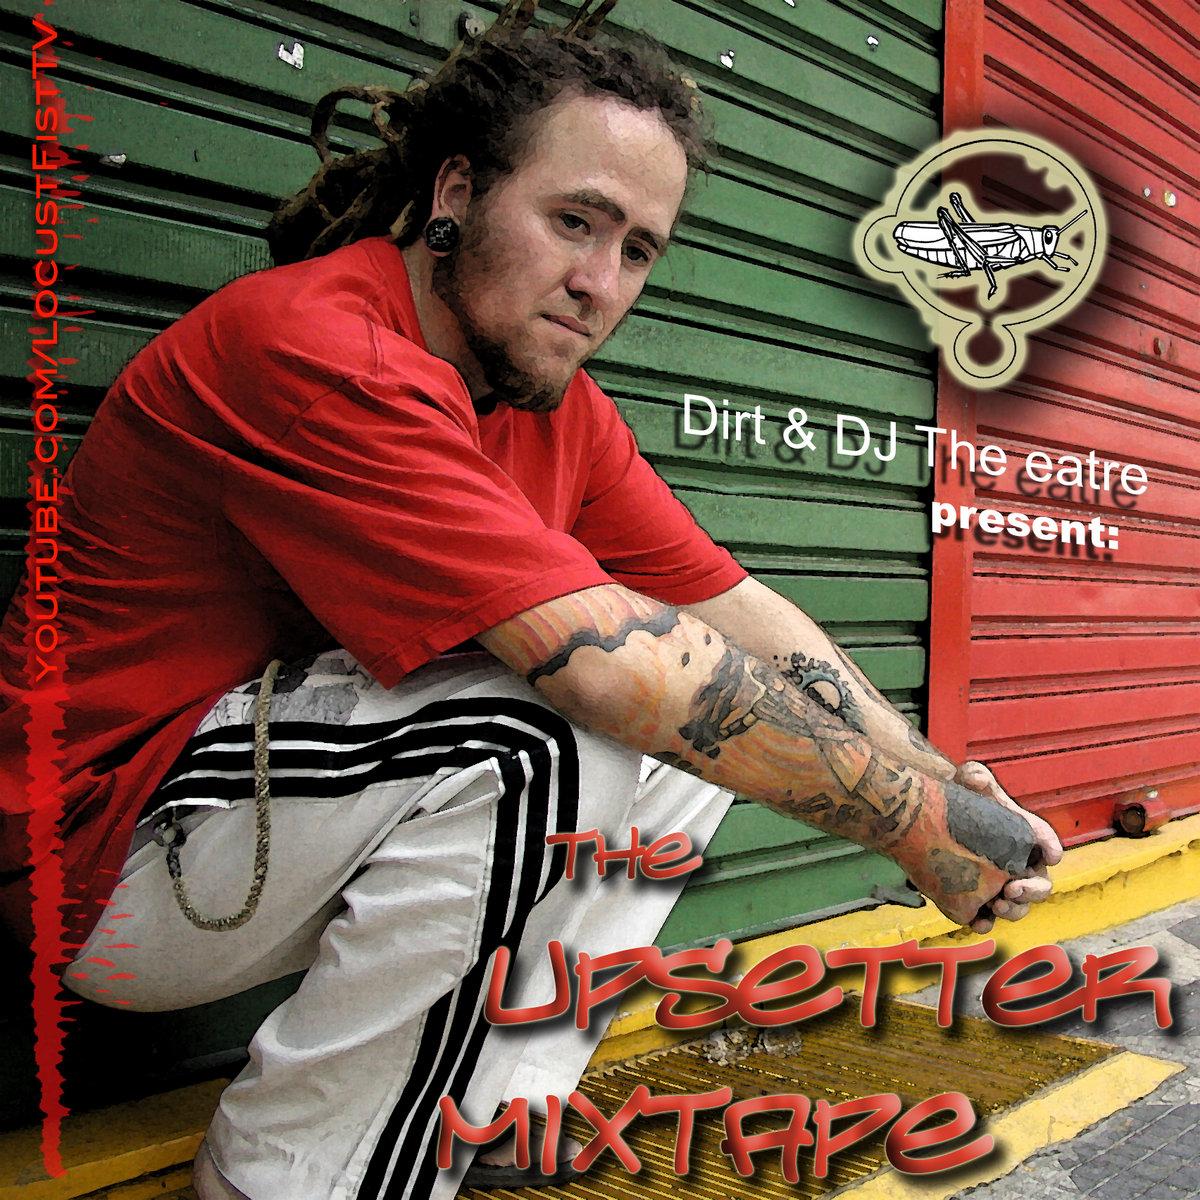 the Upsetter Mixtape | Jeremiah Dirt (Shadow of the Locust)